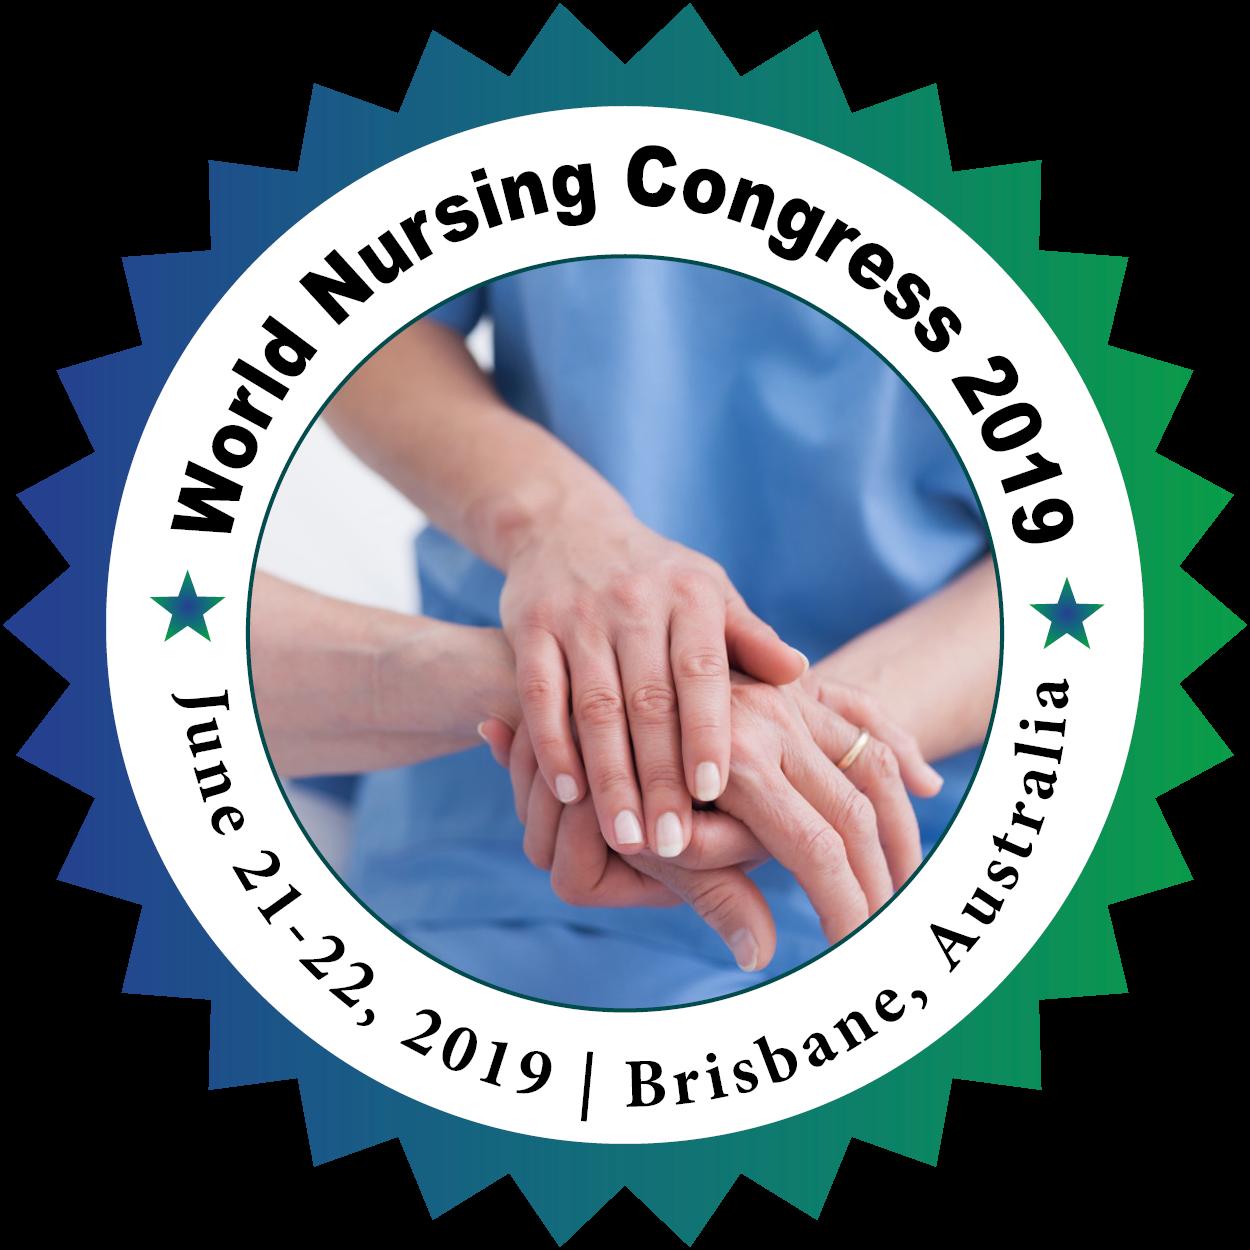 54th World Congress on Nursing & Health Care: Nursing